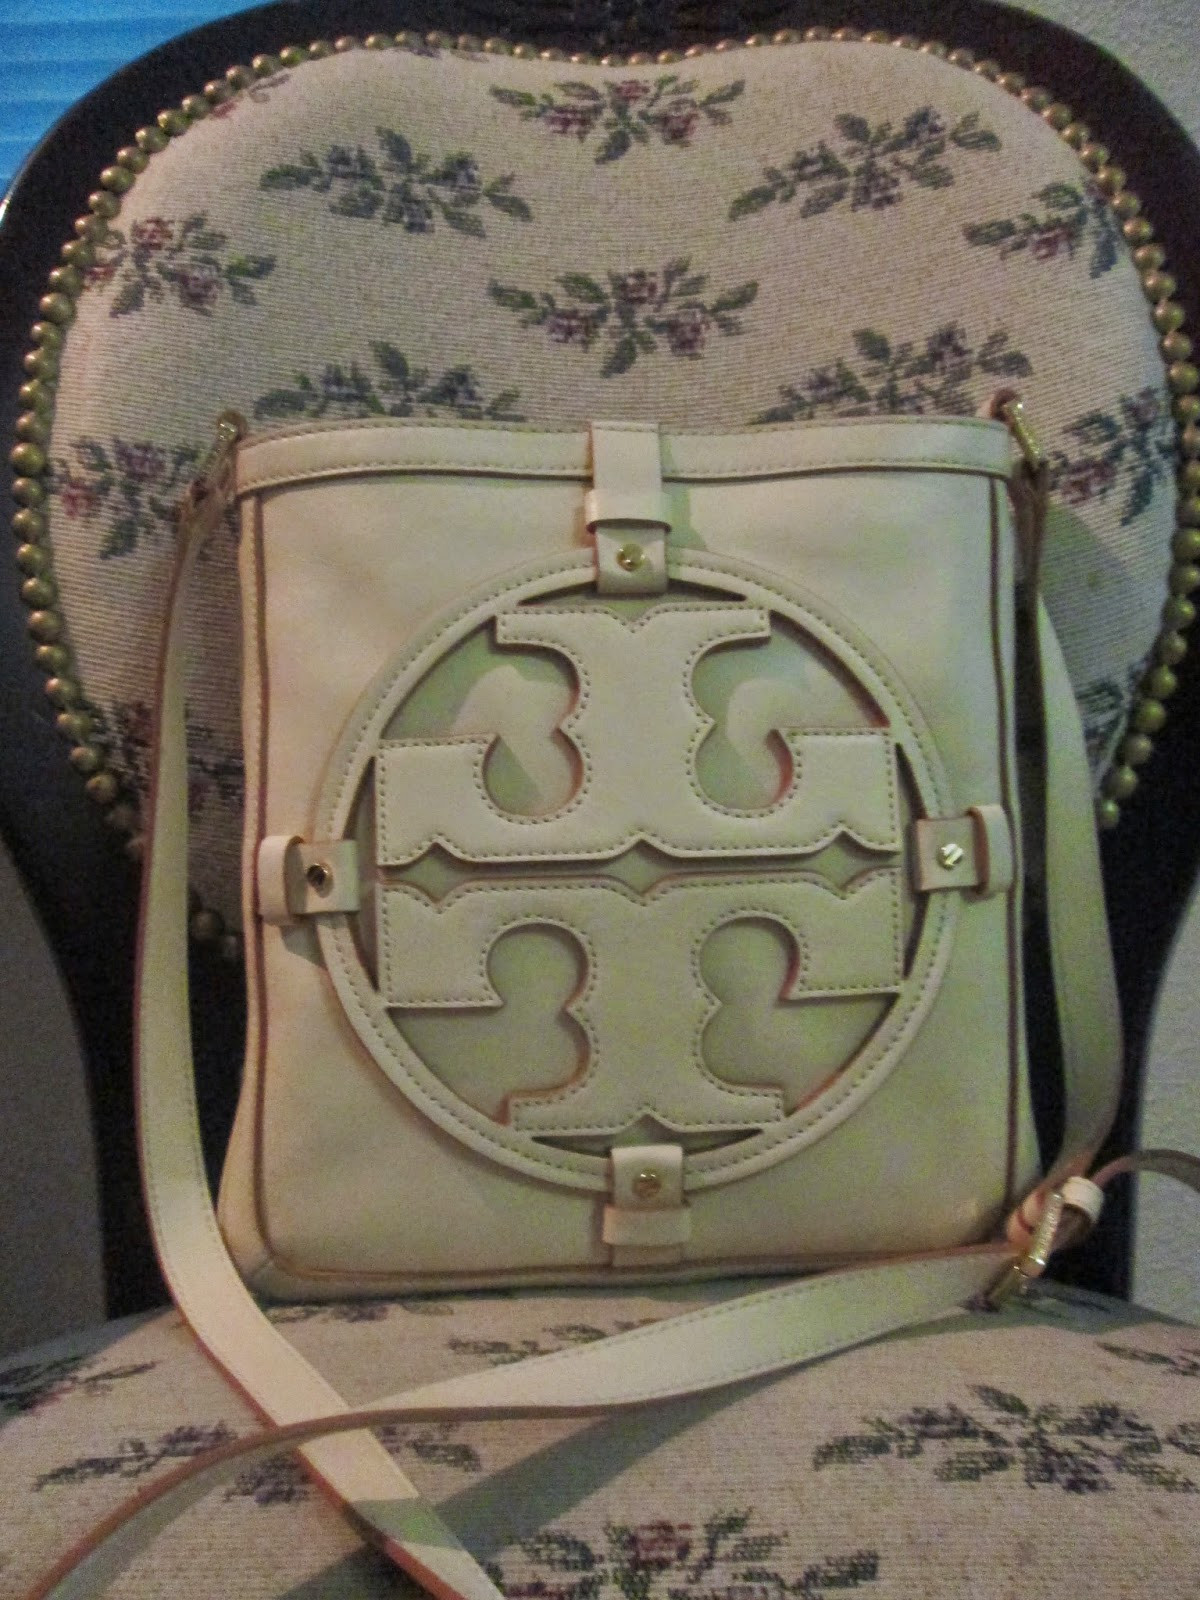 ead8184df6f Pearls   Curls  Tory Burch Holly Bookbag Review